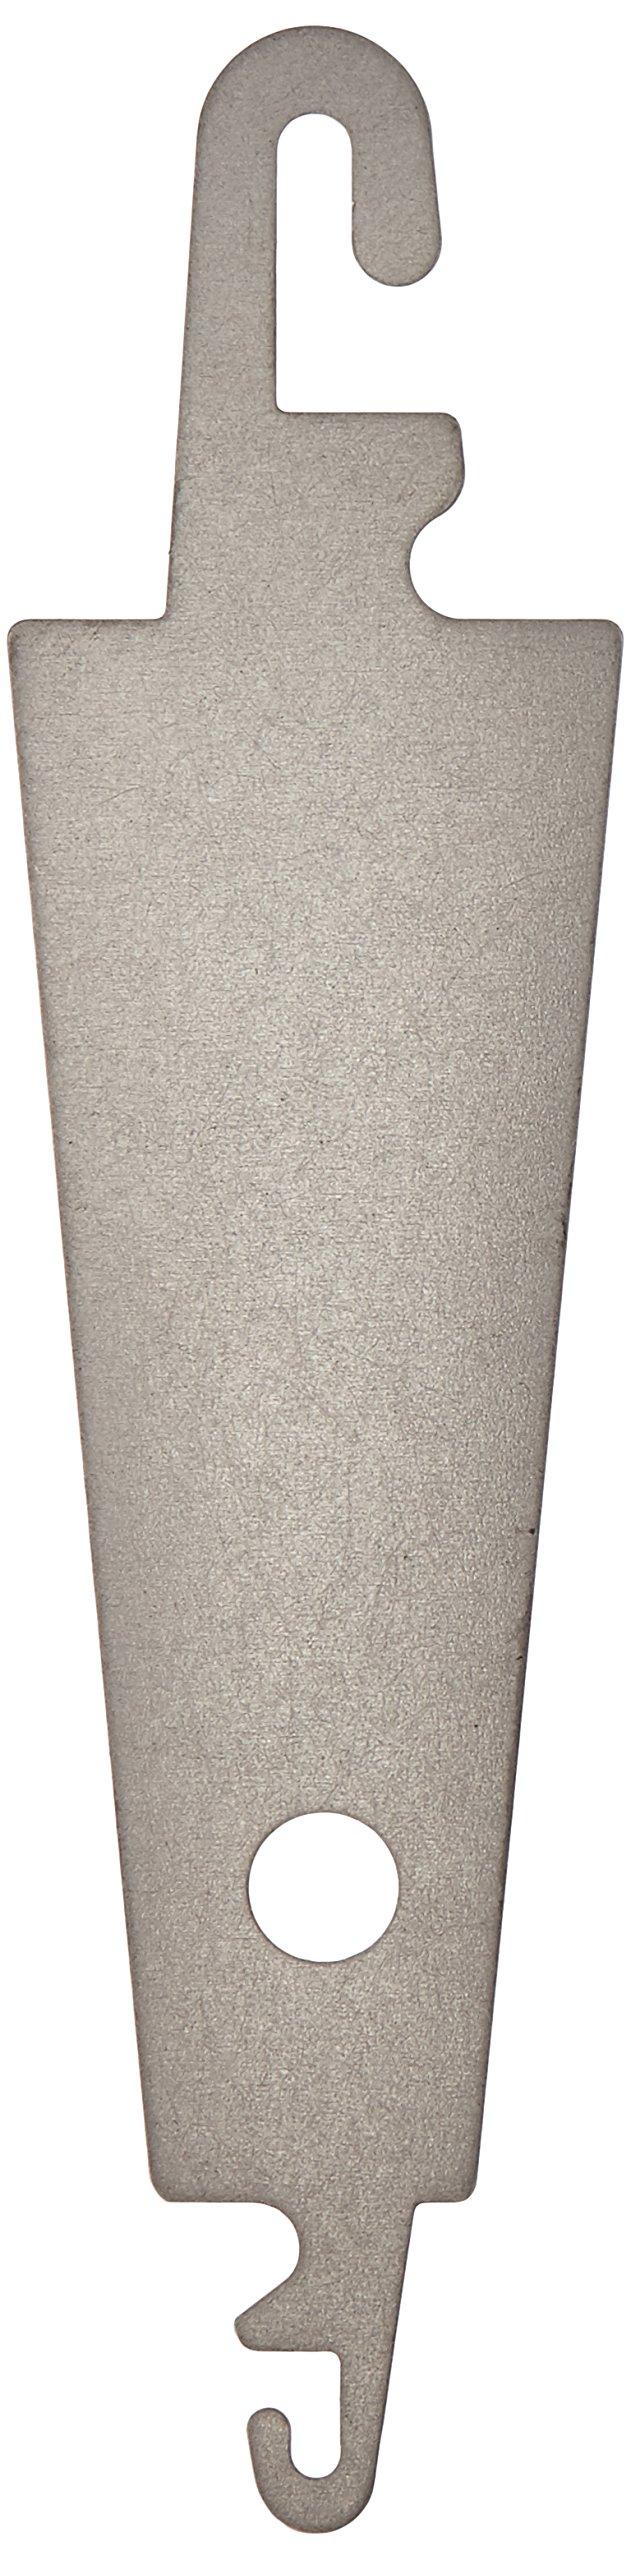 Loran Needle Threader product image